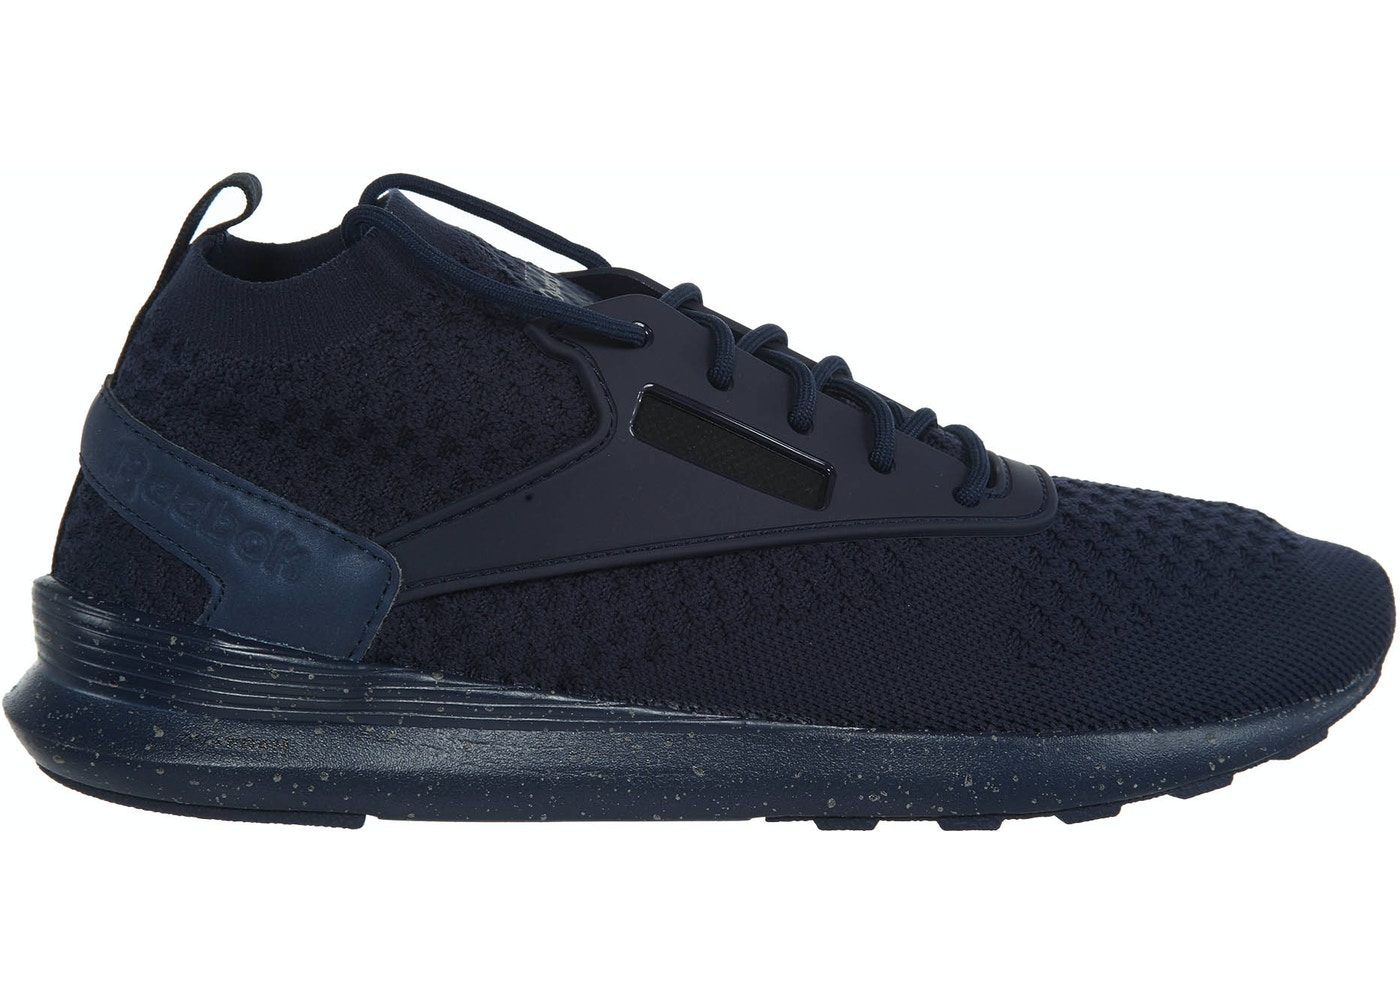 9350c37fd57 Reebok Size 13 Shoes - Lowest Ask